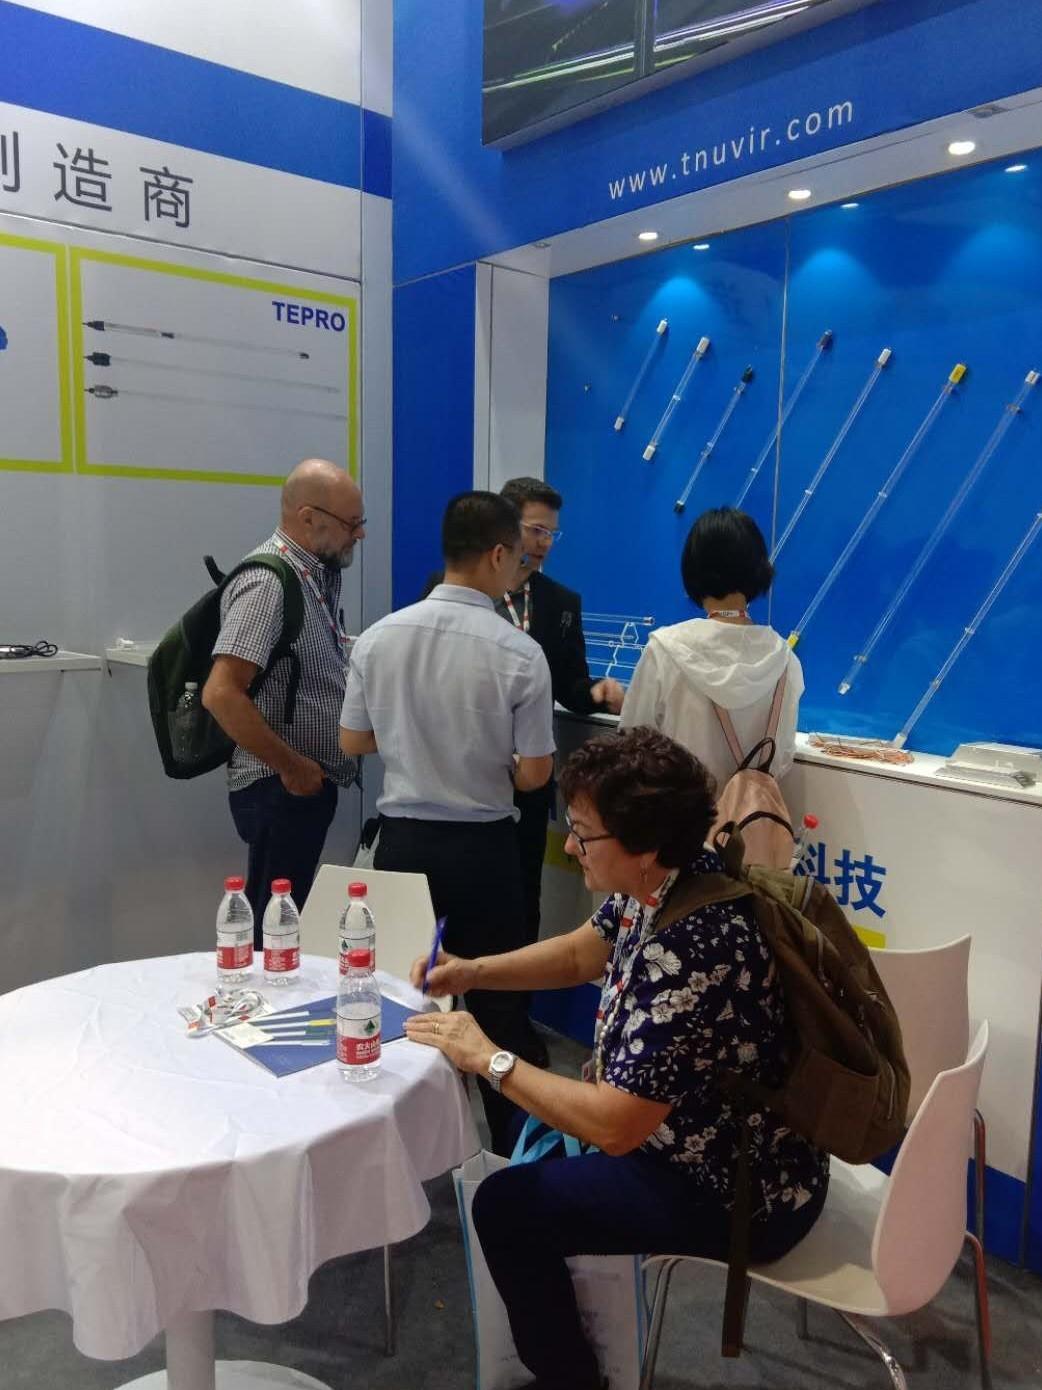 Tepro-Aquatech China Environment 2019 In Shanghai, Tepro china Co, Ltd-2